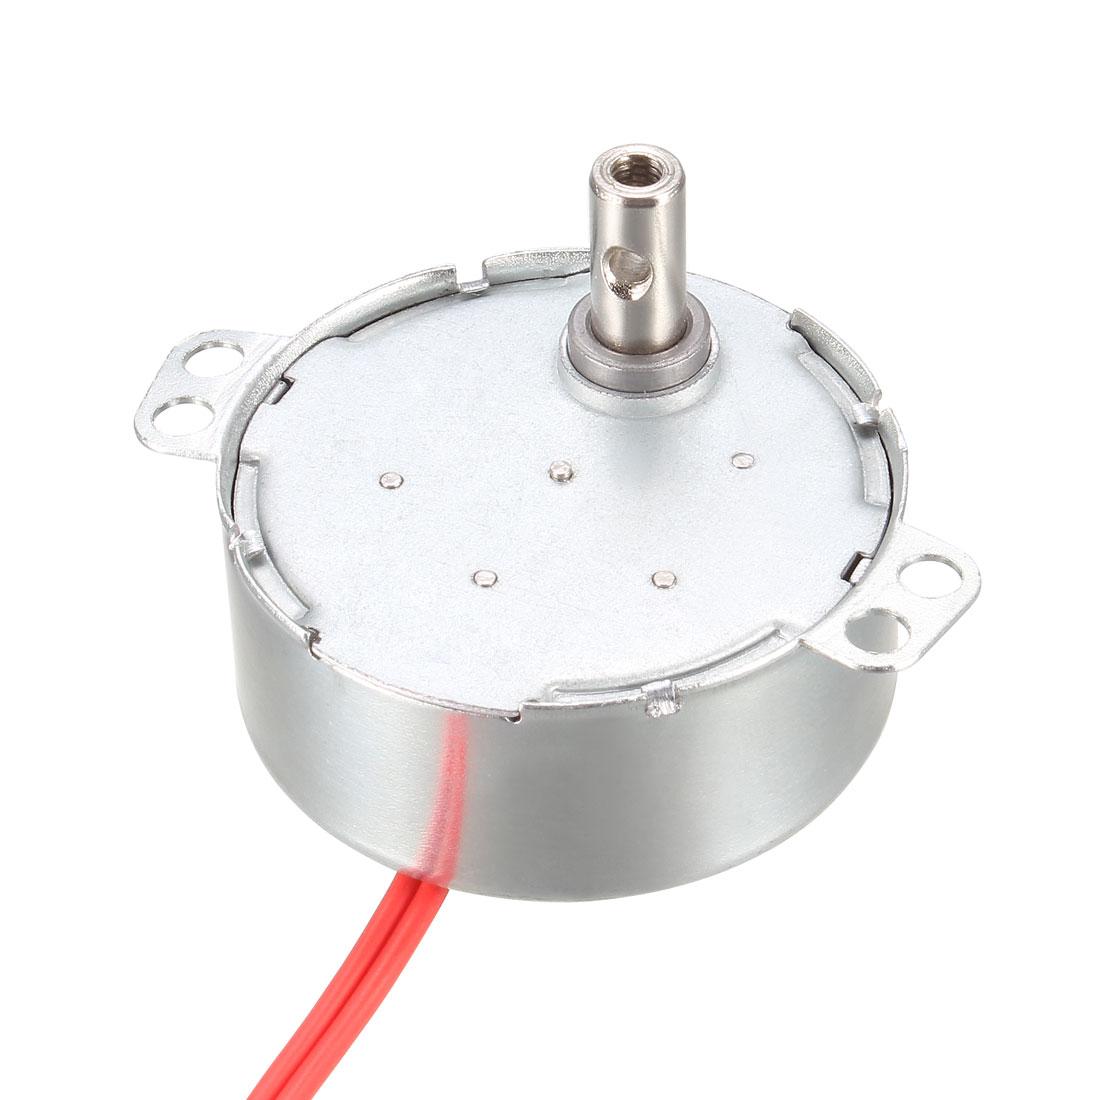 Synchronous Synchron Motor - Turntable Motor AC 12V 50-60Hz CCW/CW 4W 0.8-1RPM